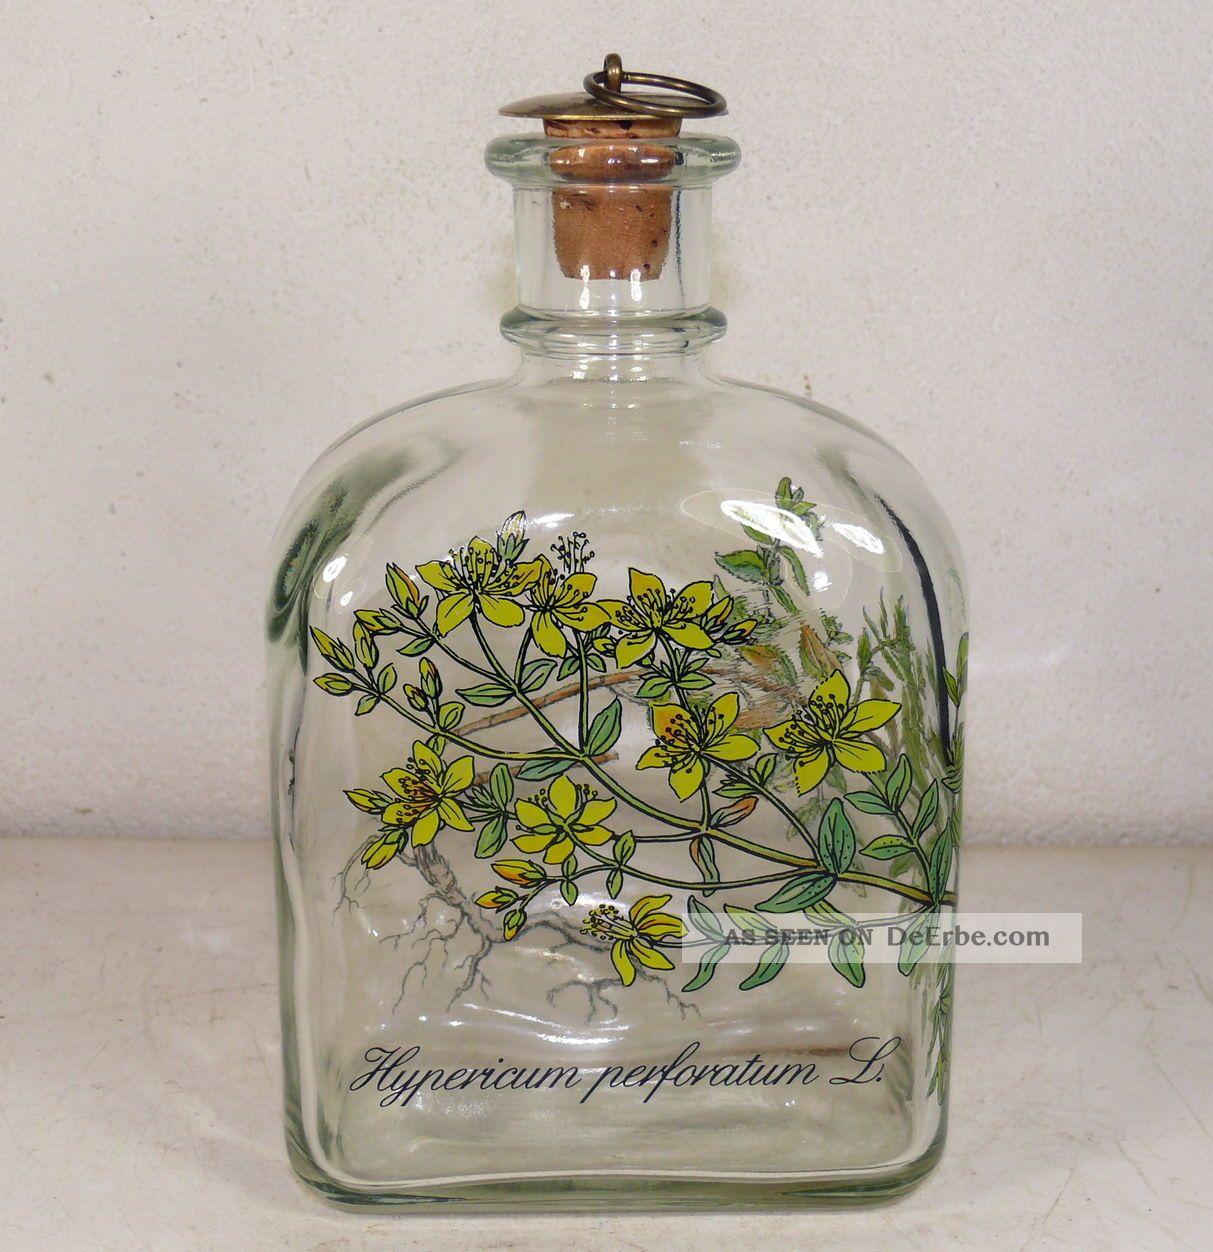 Holmegaard M.  Bang - Likörflasche Hypericum Perforatum L.  /echtes Johanniskraut Sammlerglas Bild